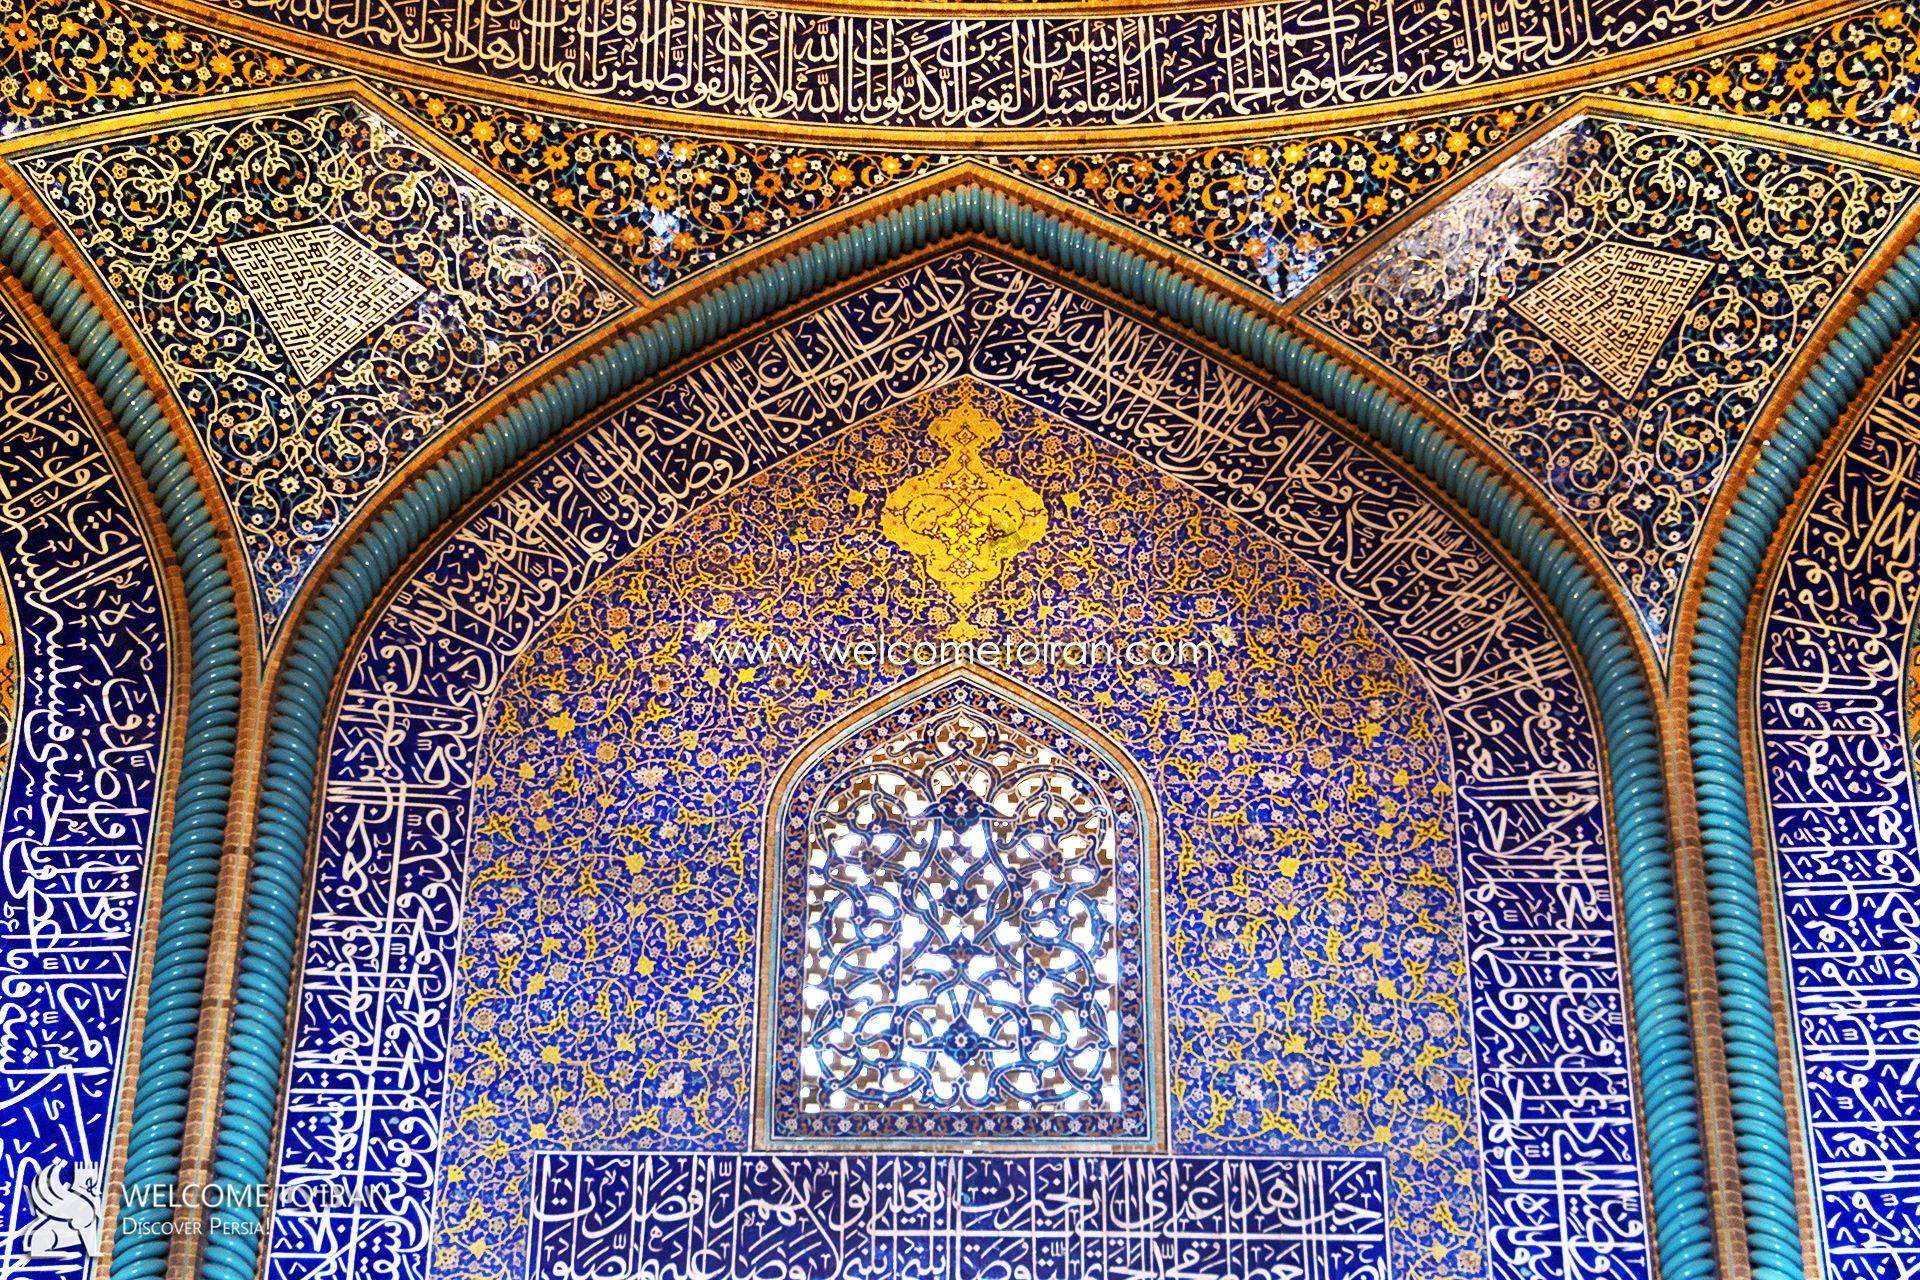 Memories of Esfahan: Half the World-a2e77b4a08f298befe5a53e0fc52a9f4-jpg